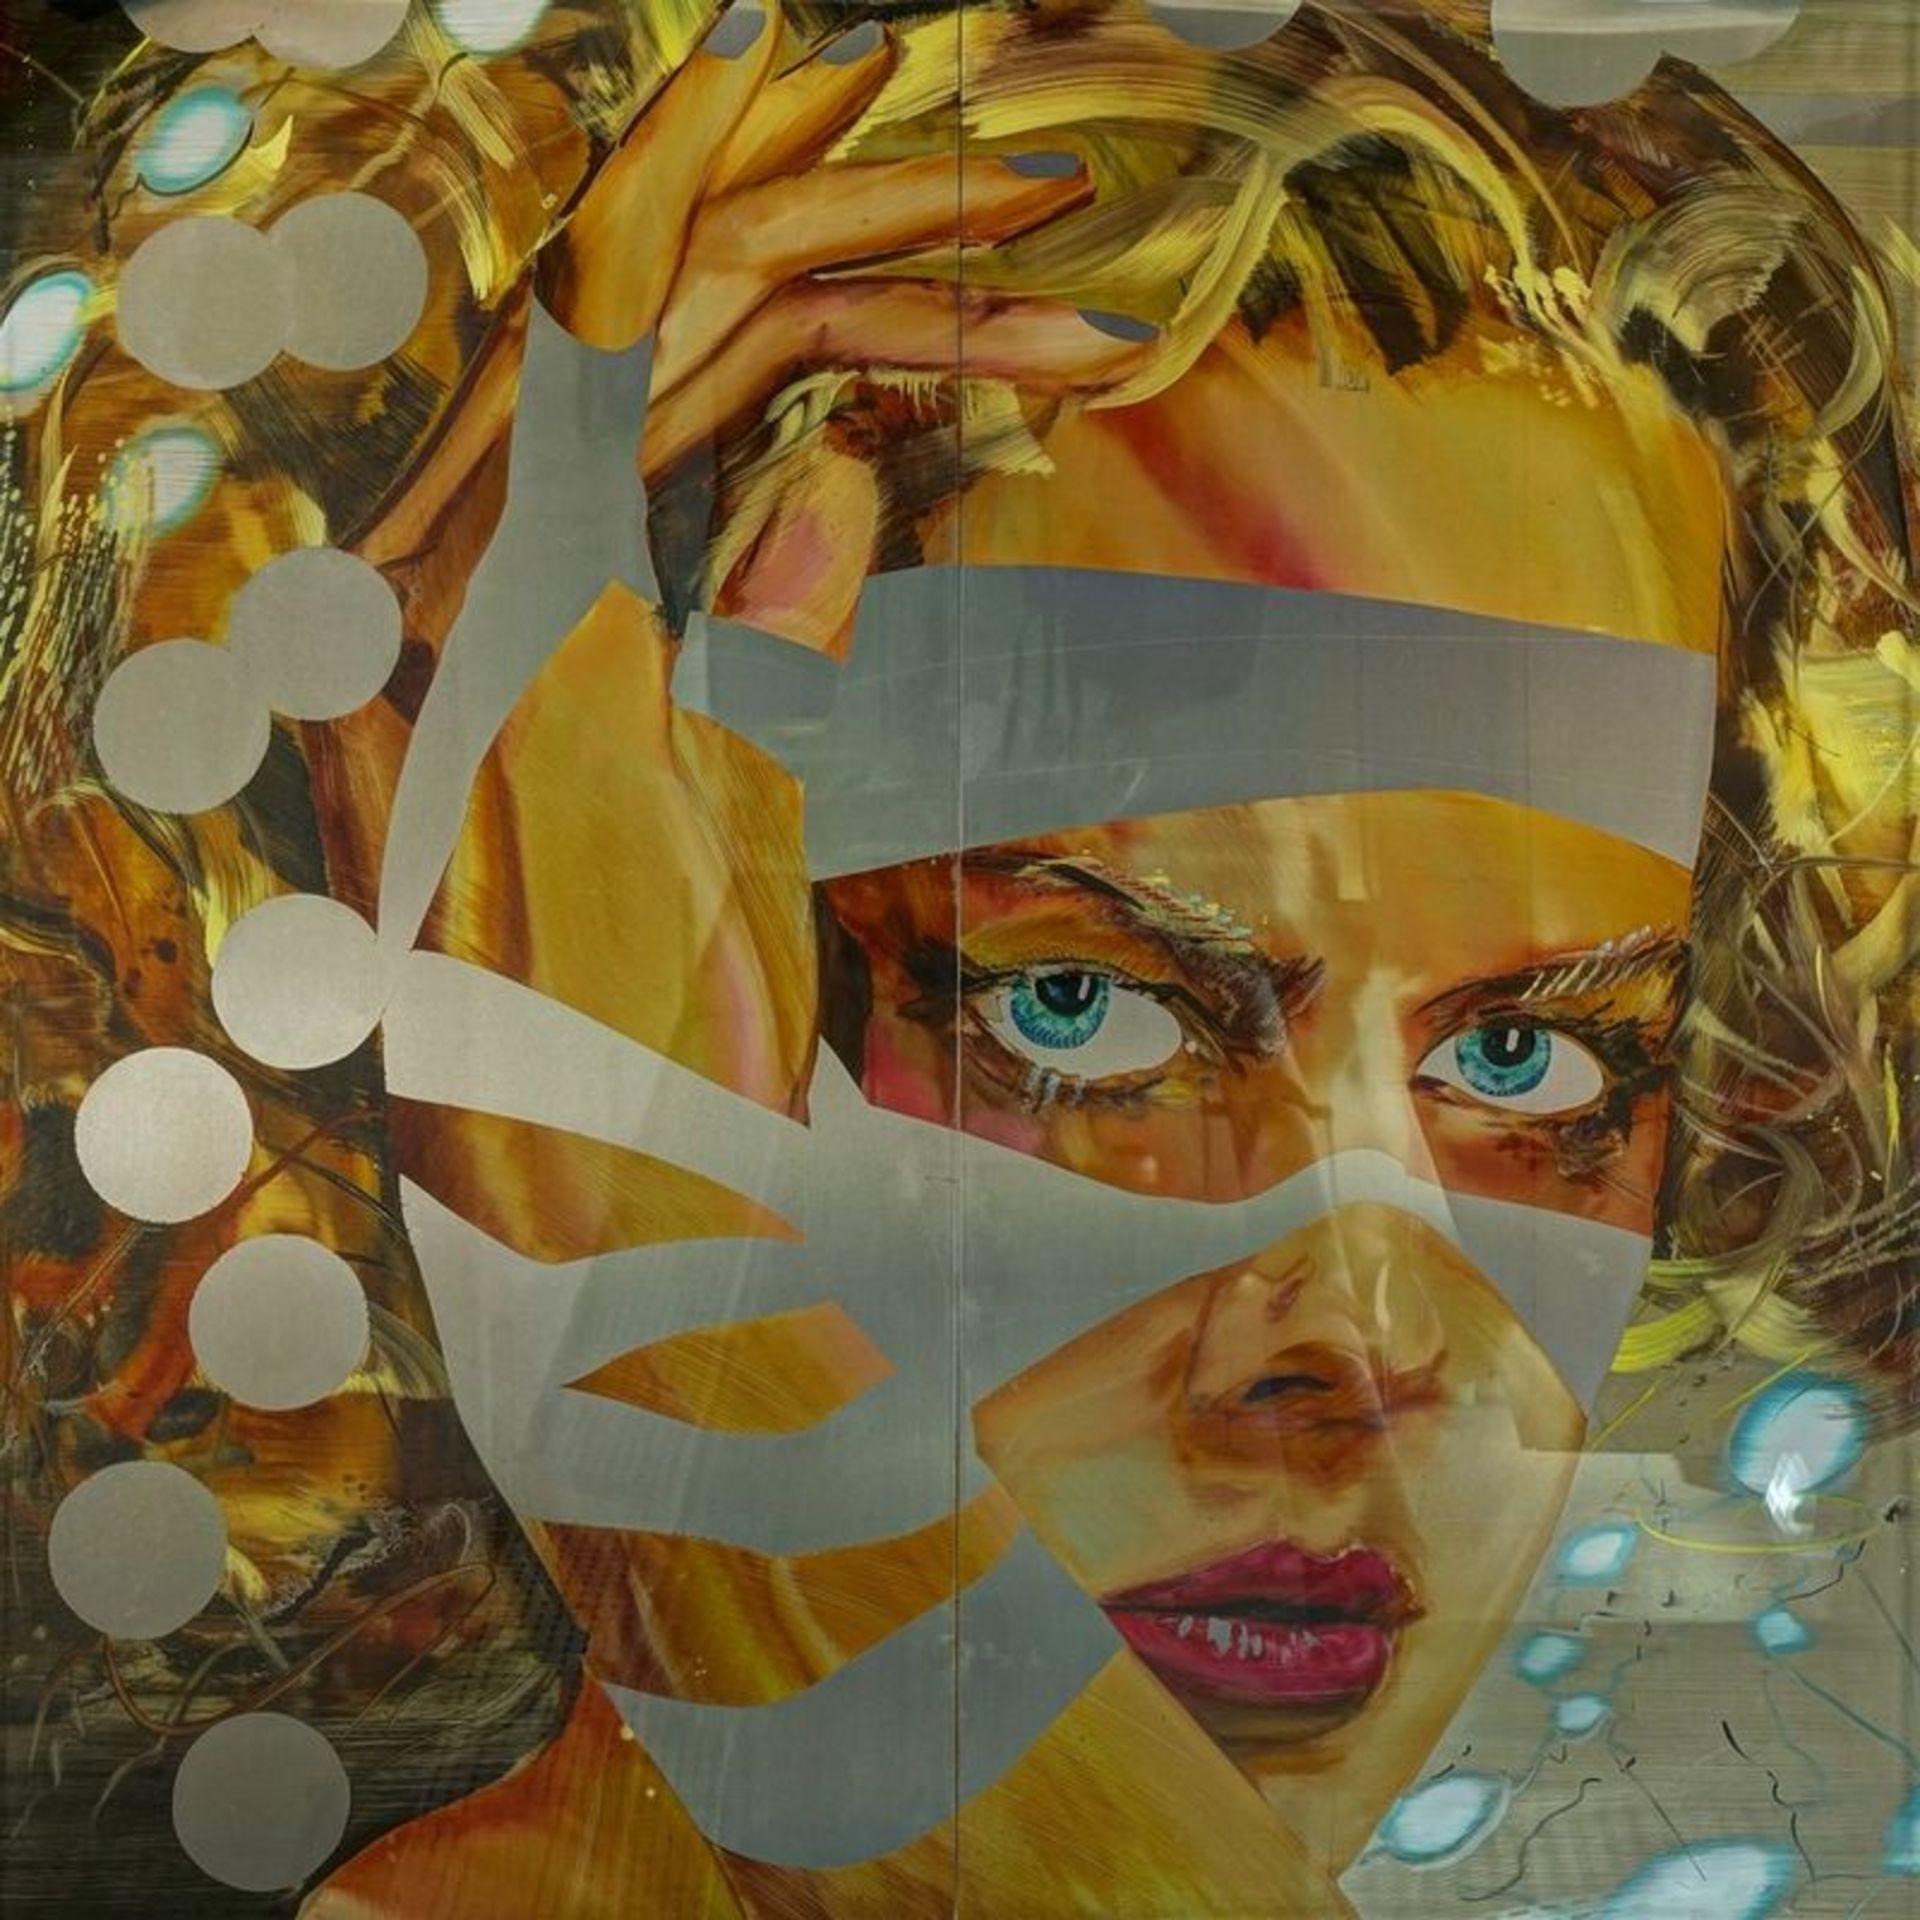 Los 558 - MATTHIAS KÖSTER (B 1961) Nicole Kidman - Mixed media on aluminium under [...]